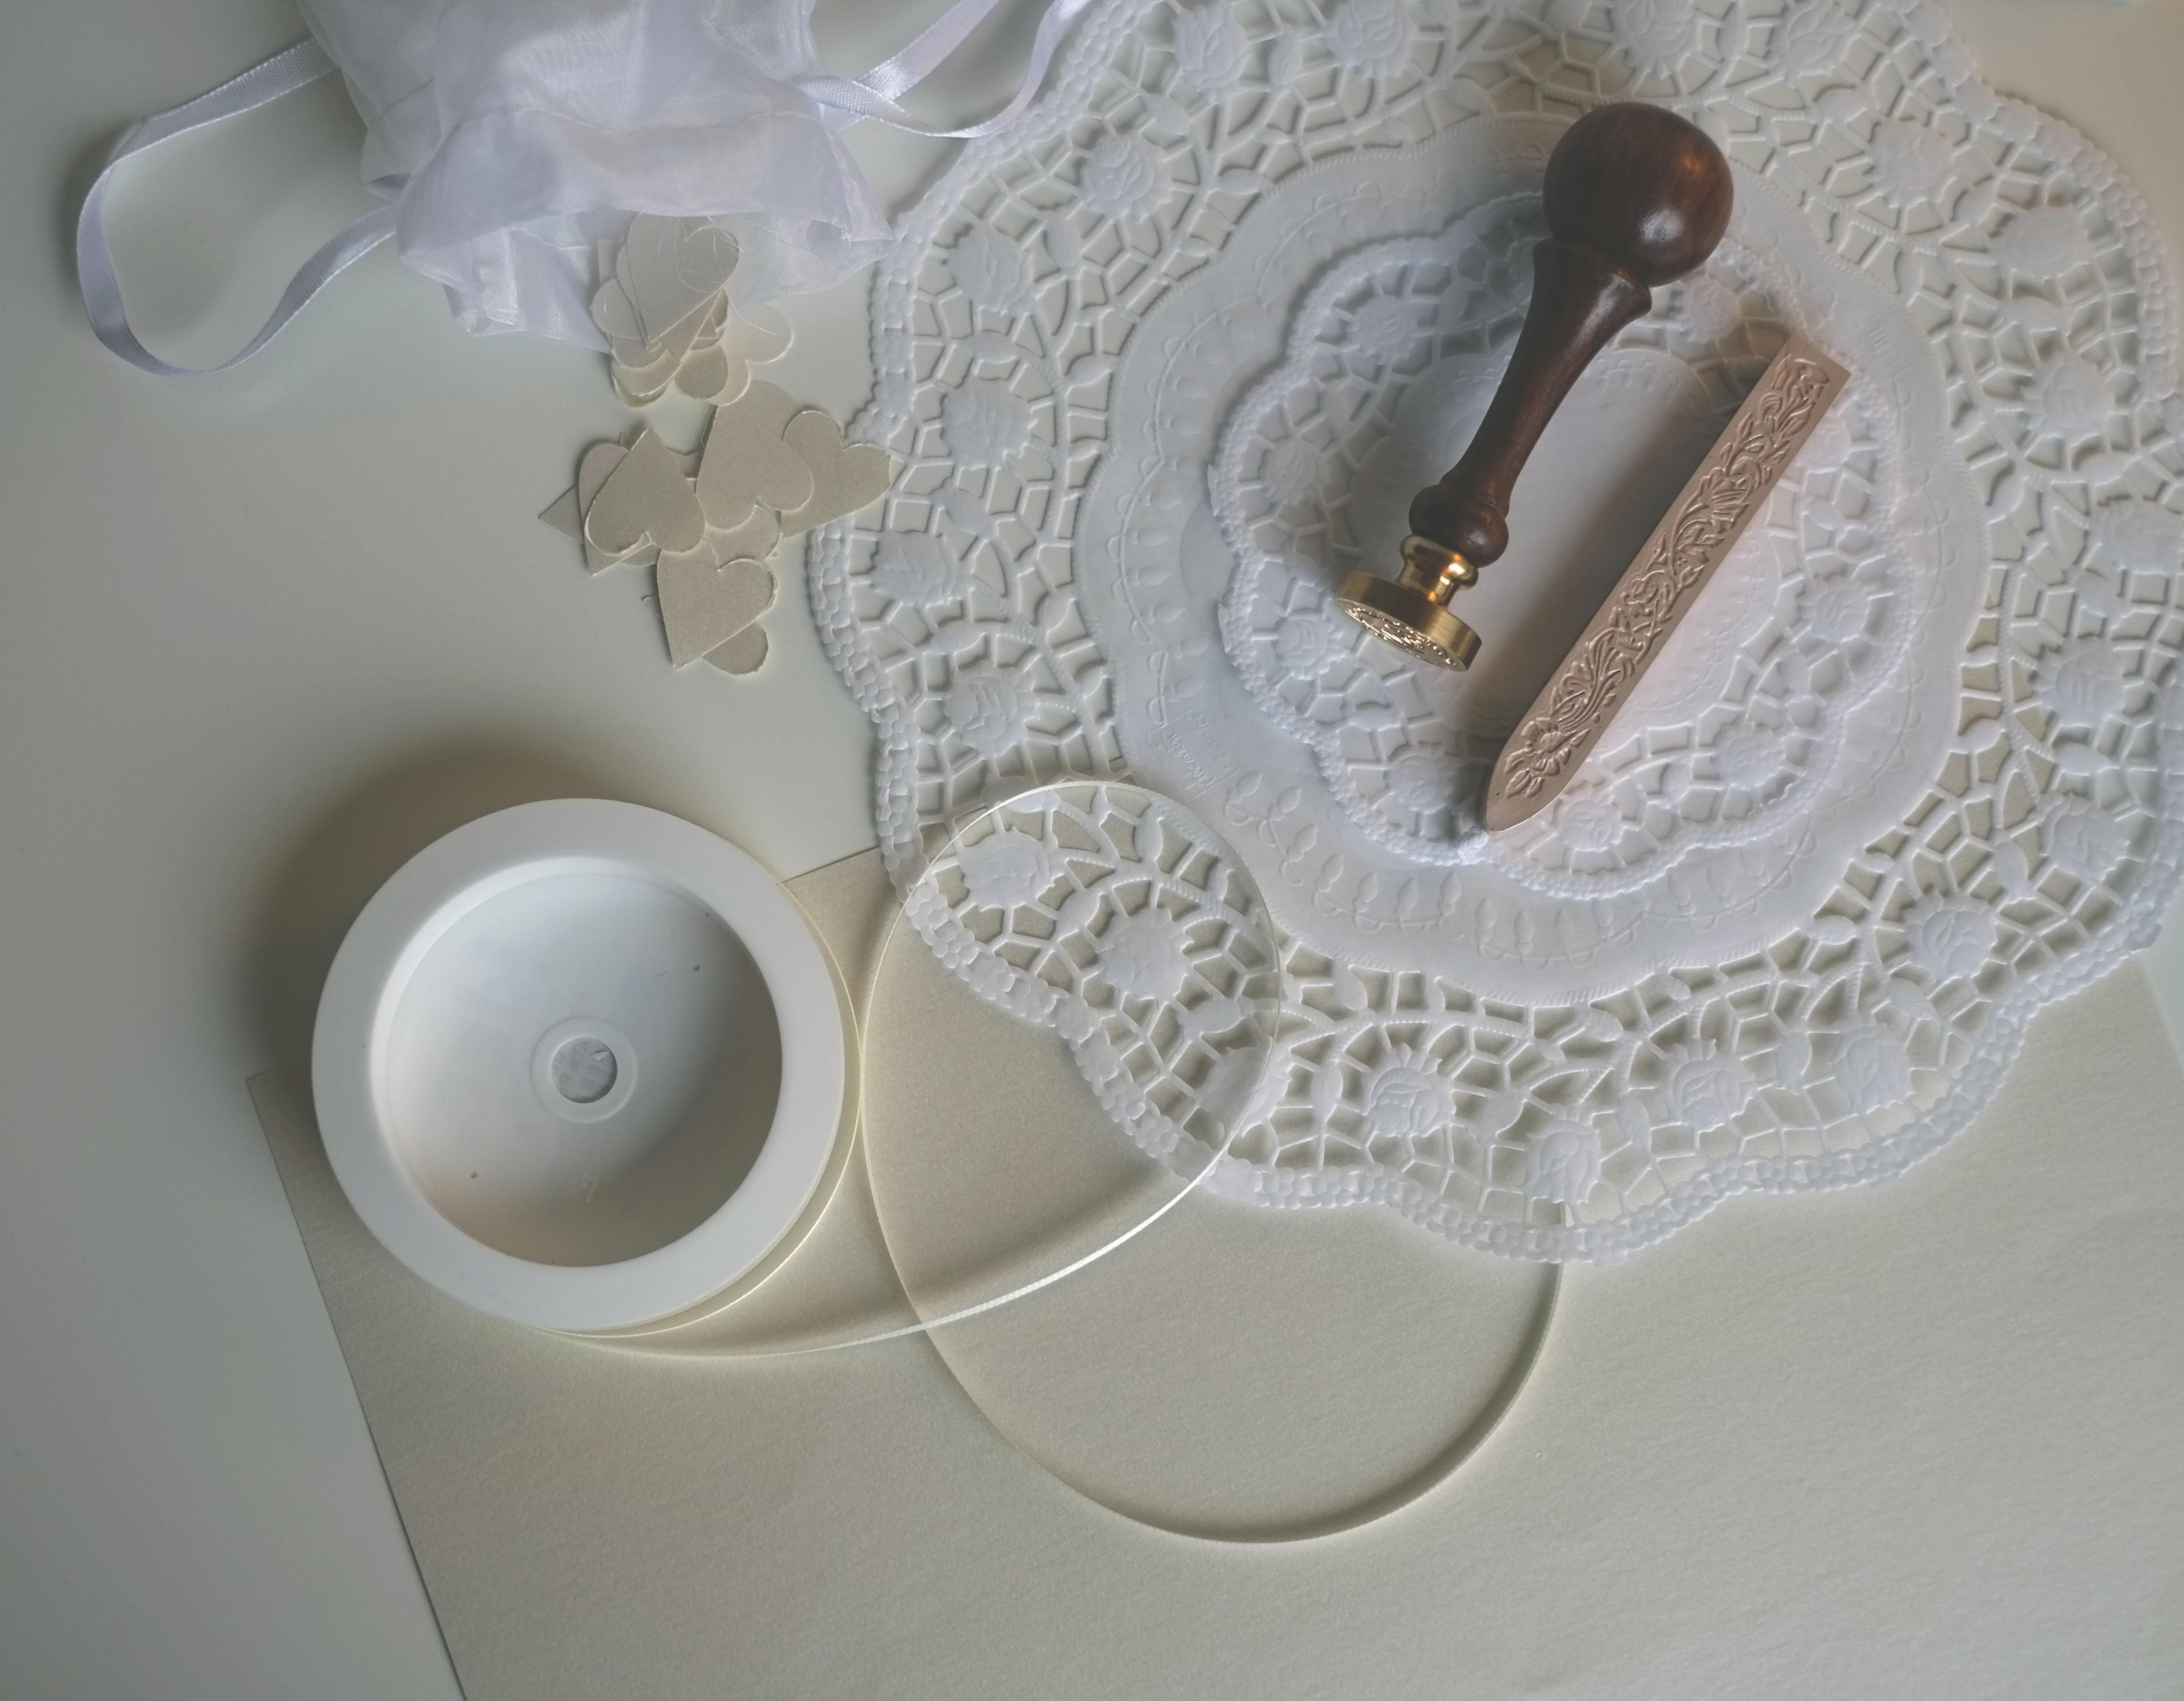 Vintage Hochzeitseinladung Diy Vintaliciously Vintage Blog